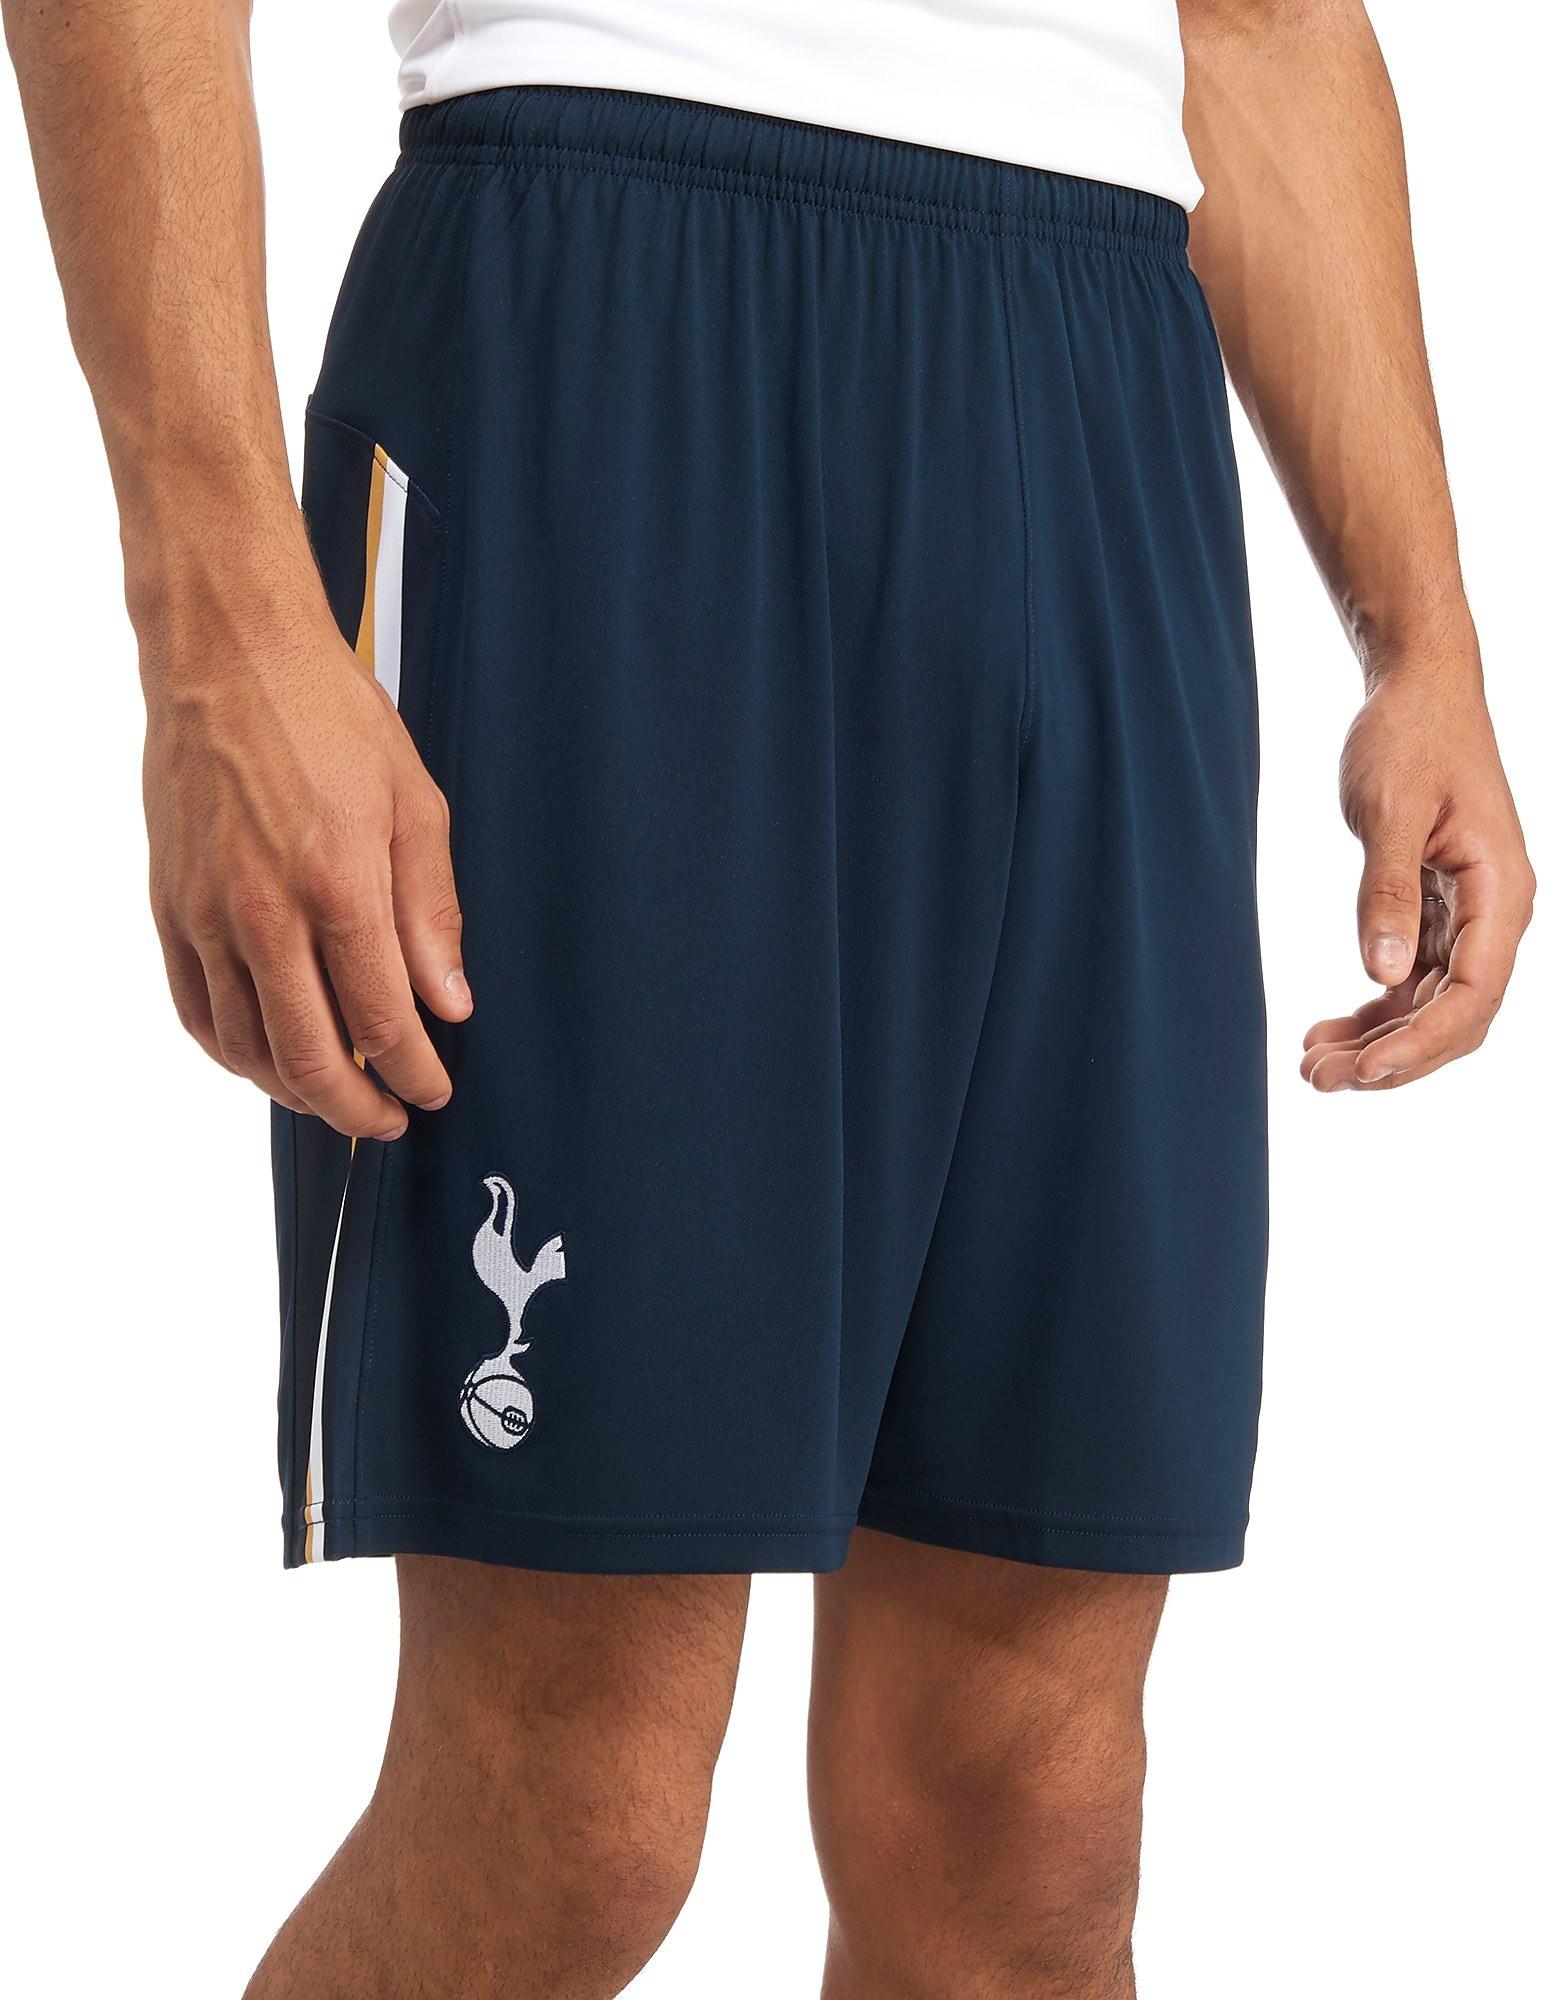 Under Armour Tottenham Hotspur FC 2016/17 Home Shorts